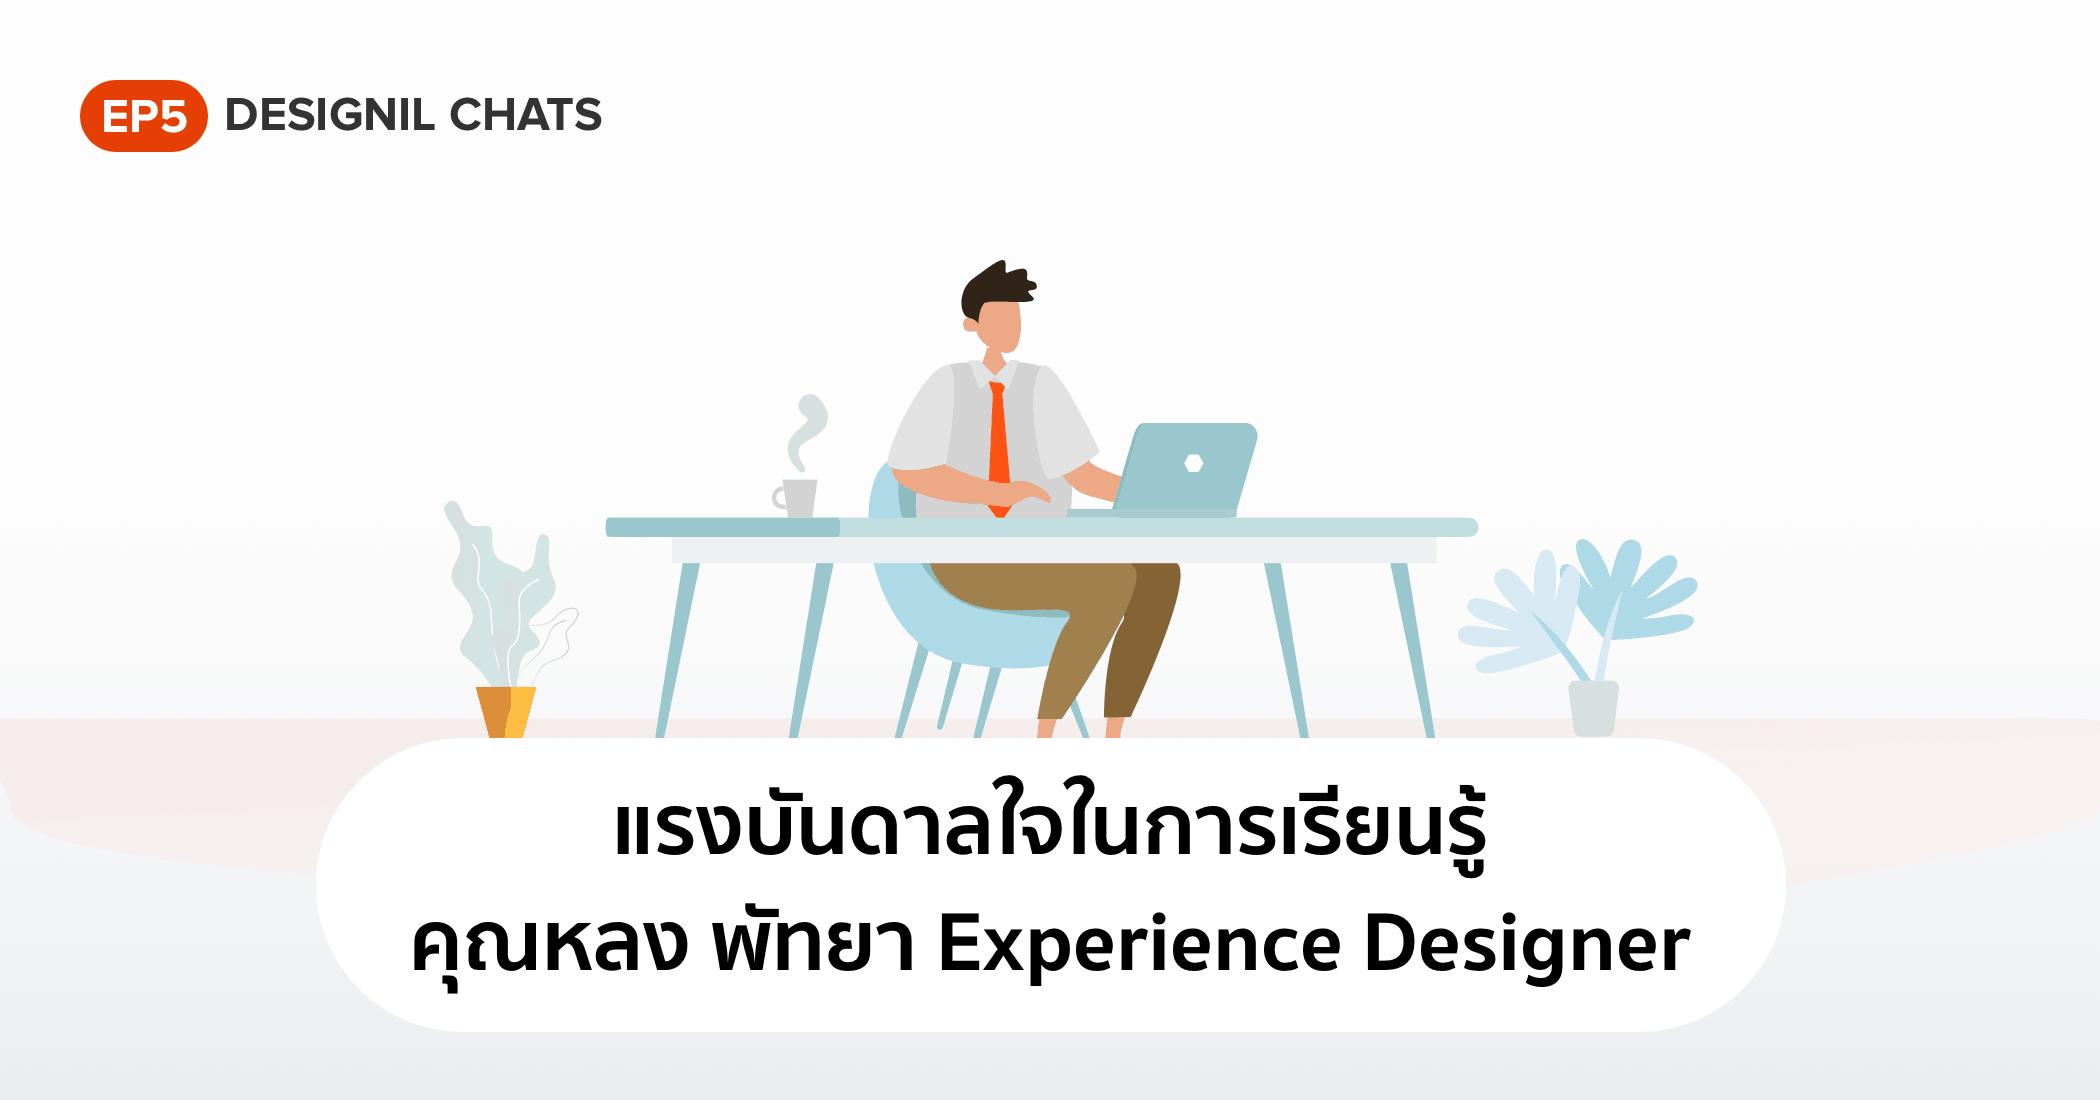 designil chats ep5 2